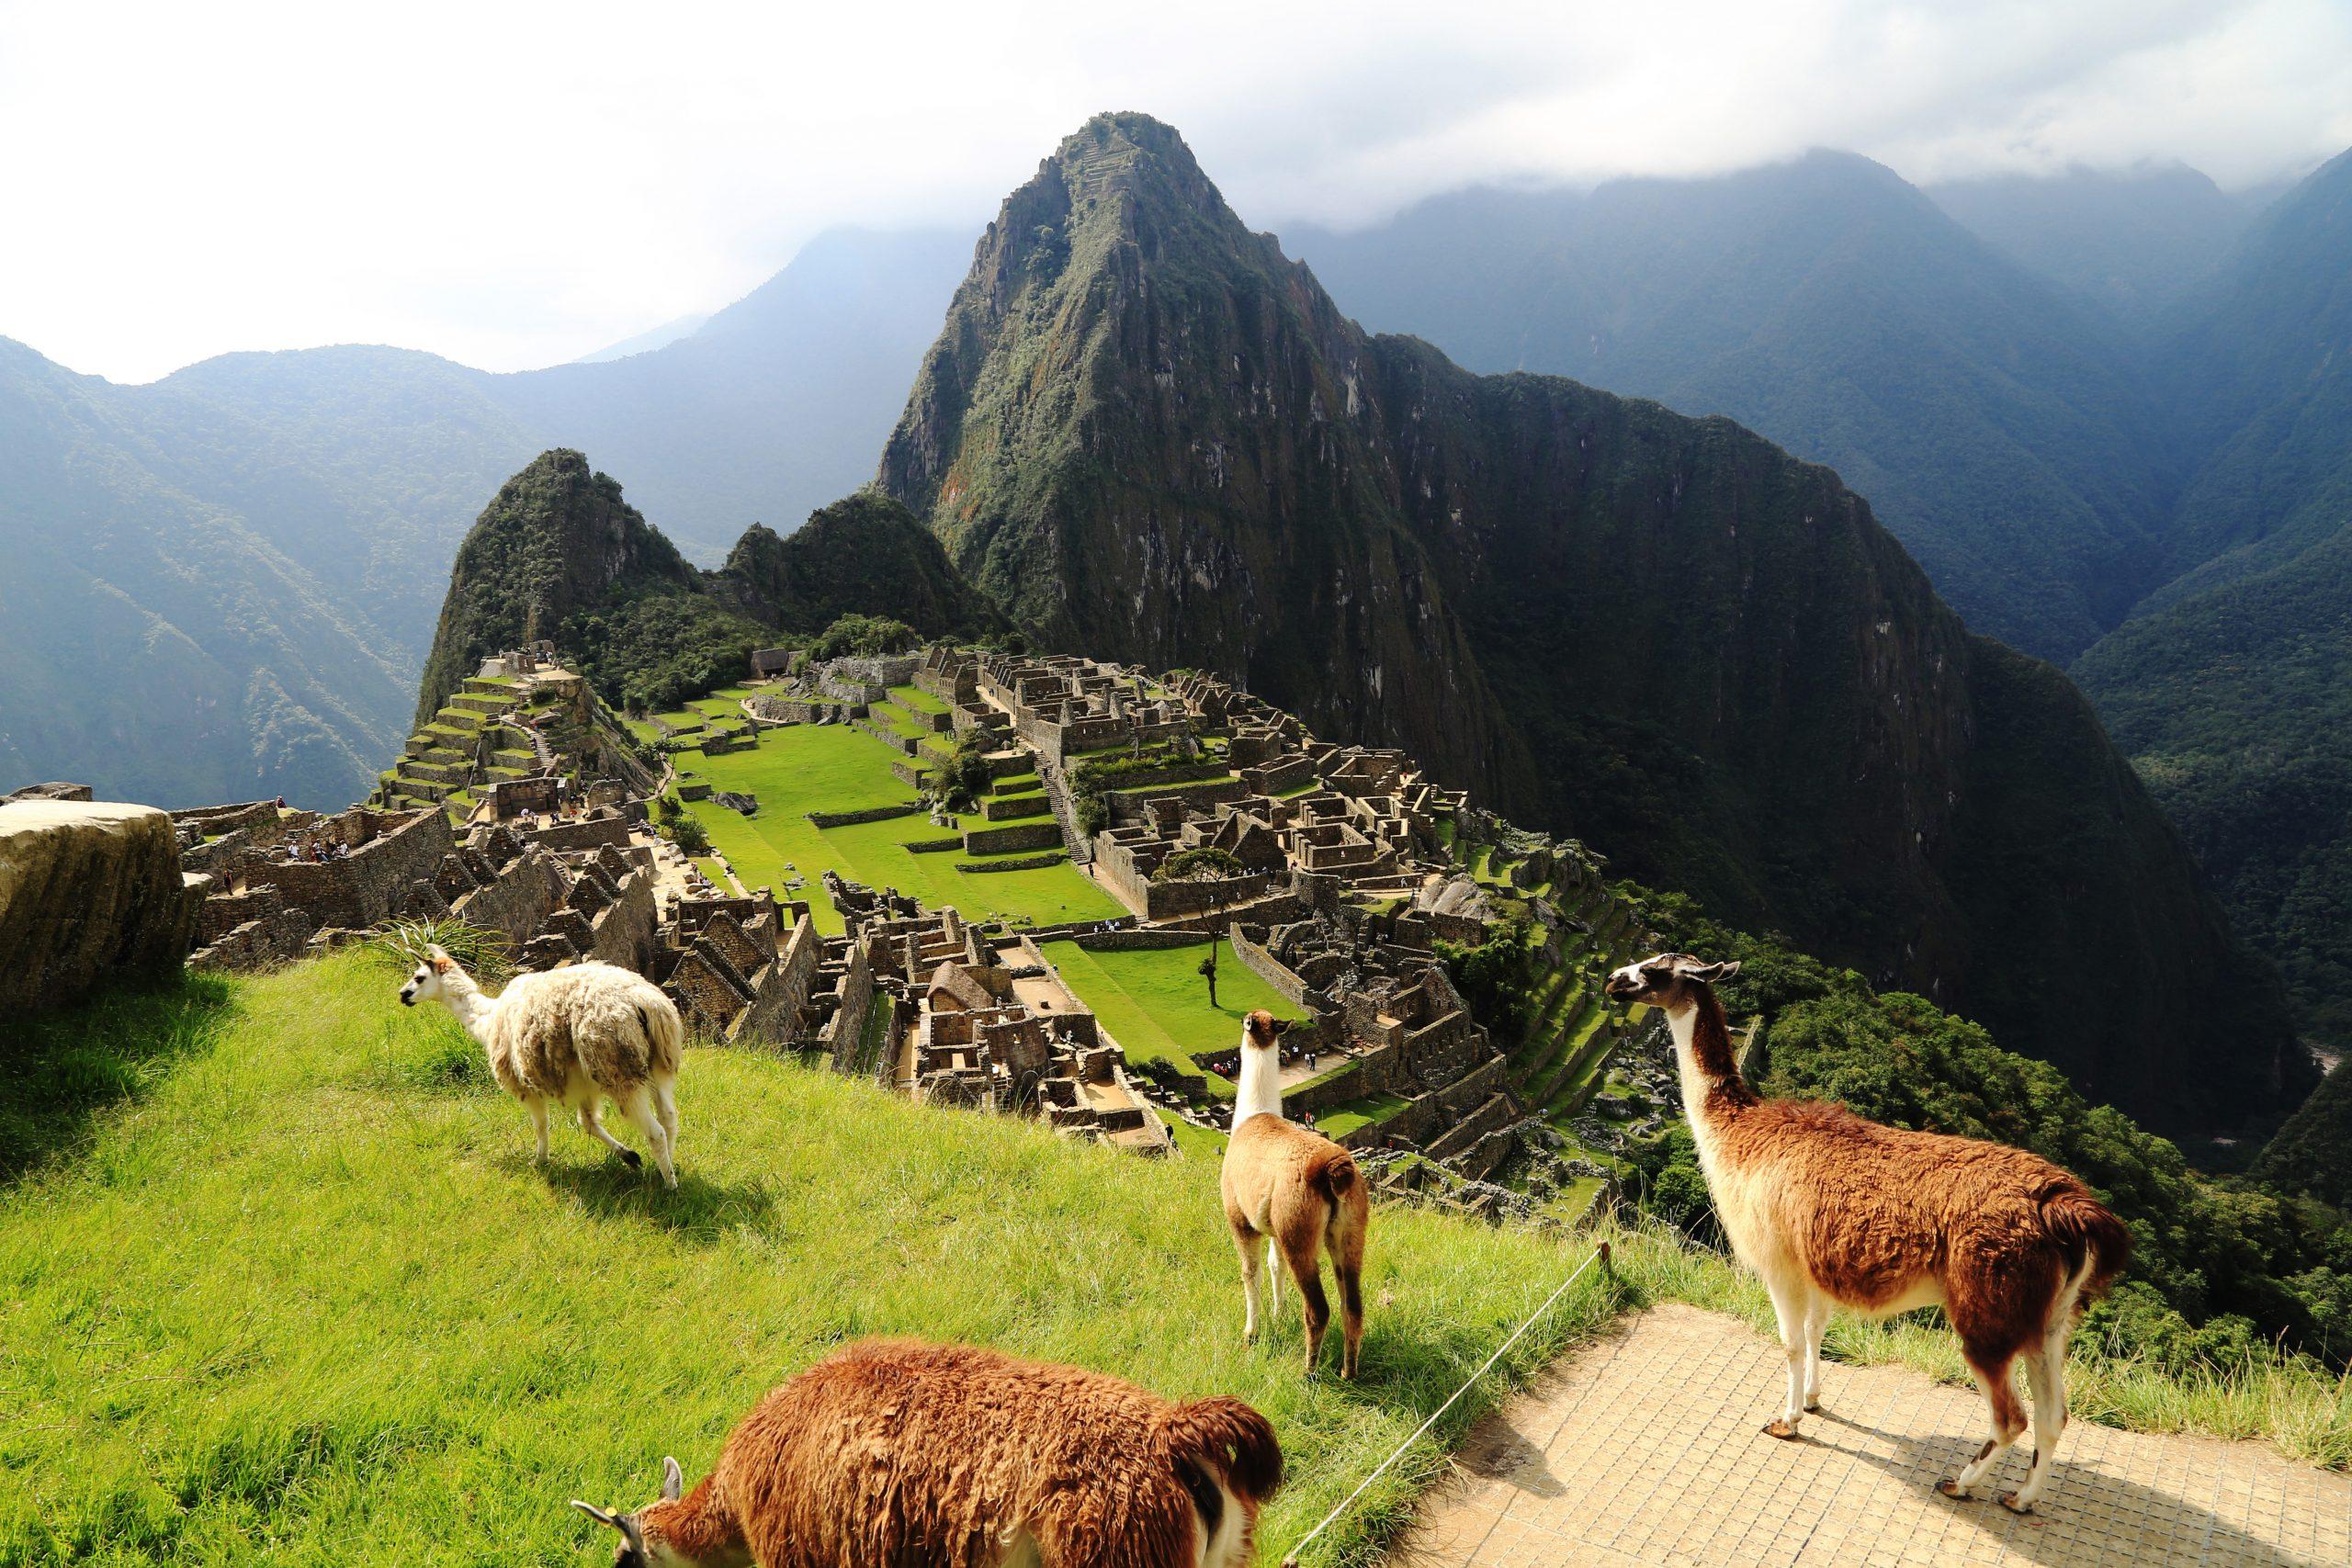 Alpacas on top of Machu Pichu